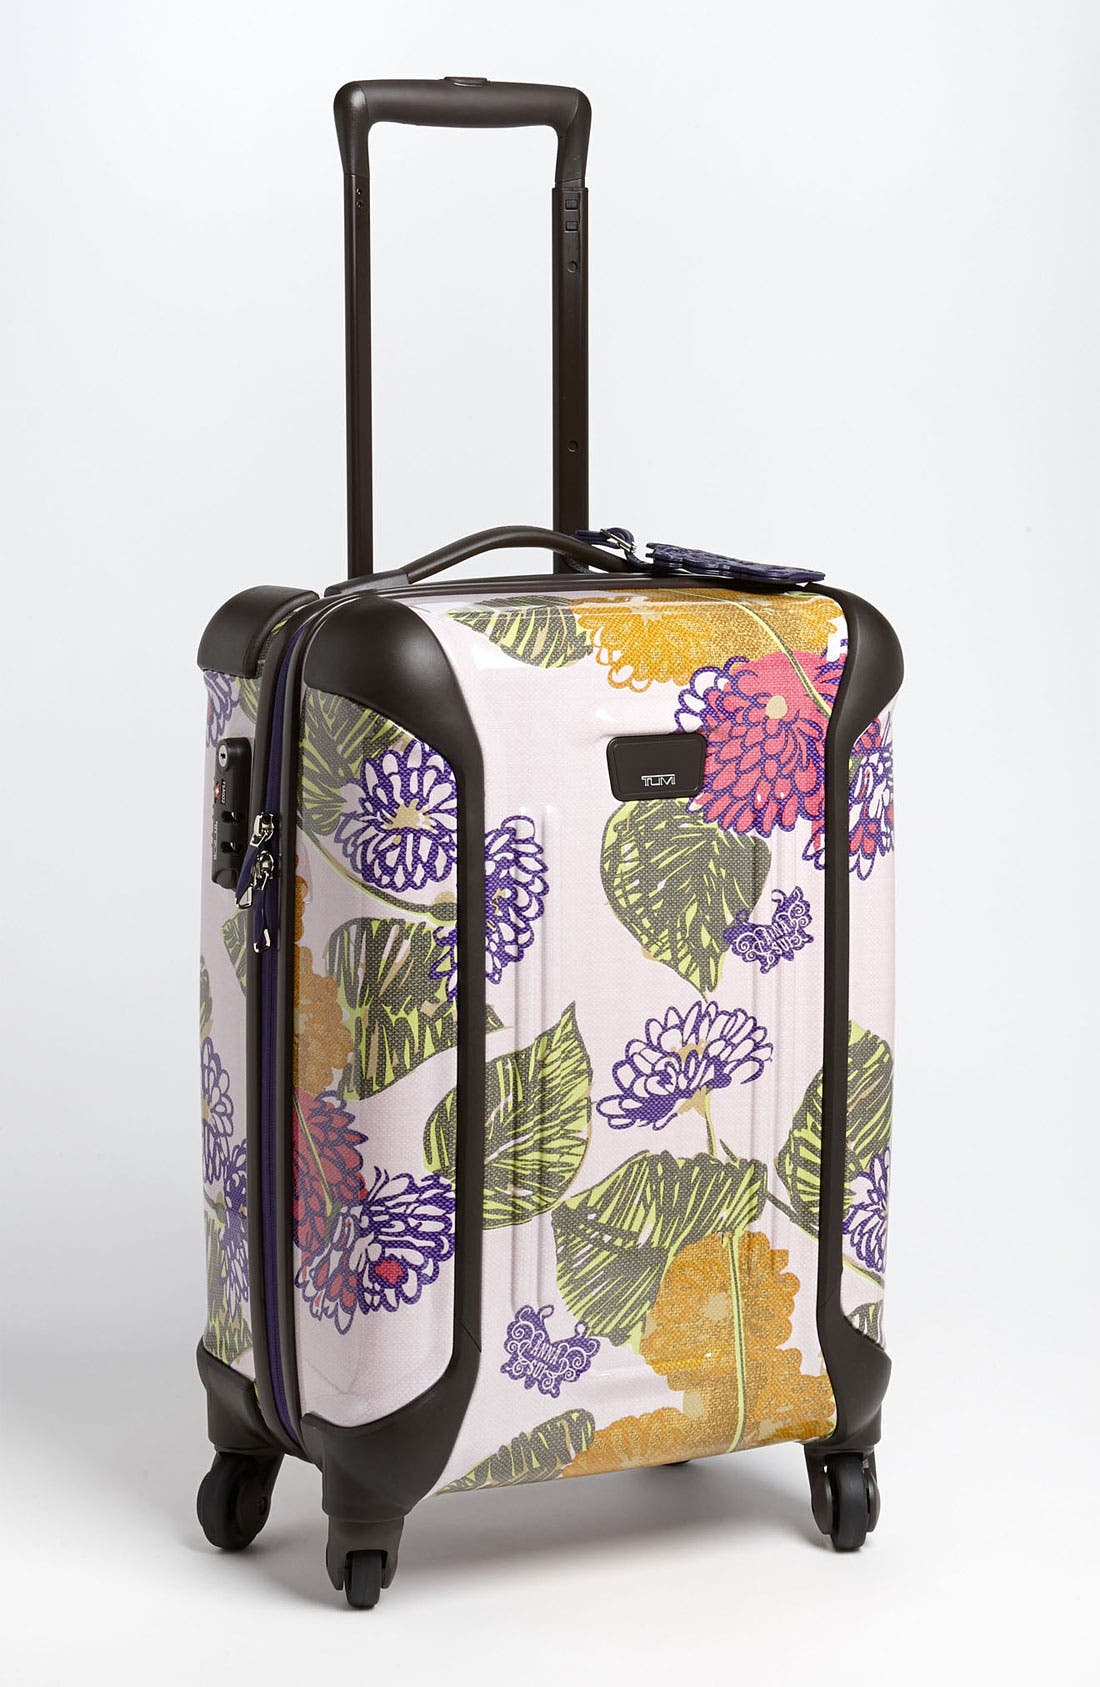 Main Image - Tumi 'Vapor™ - Anna Sui' International Carry-On Bag